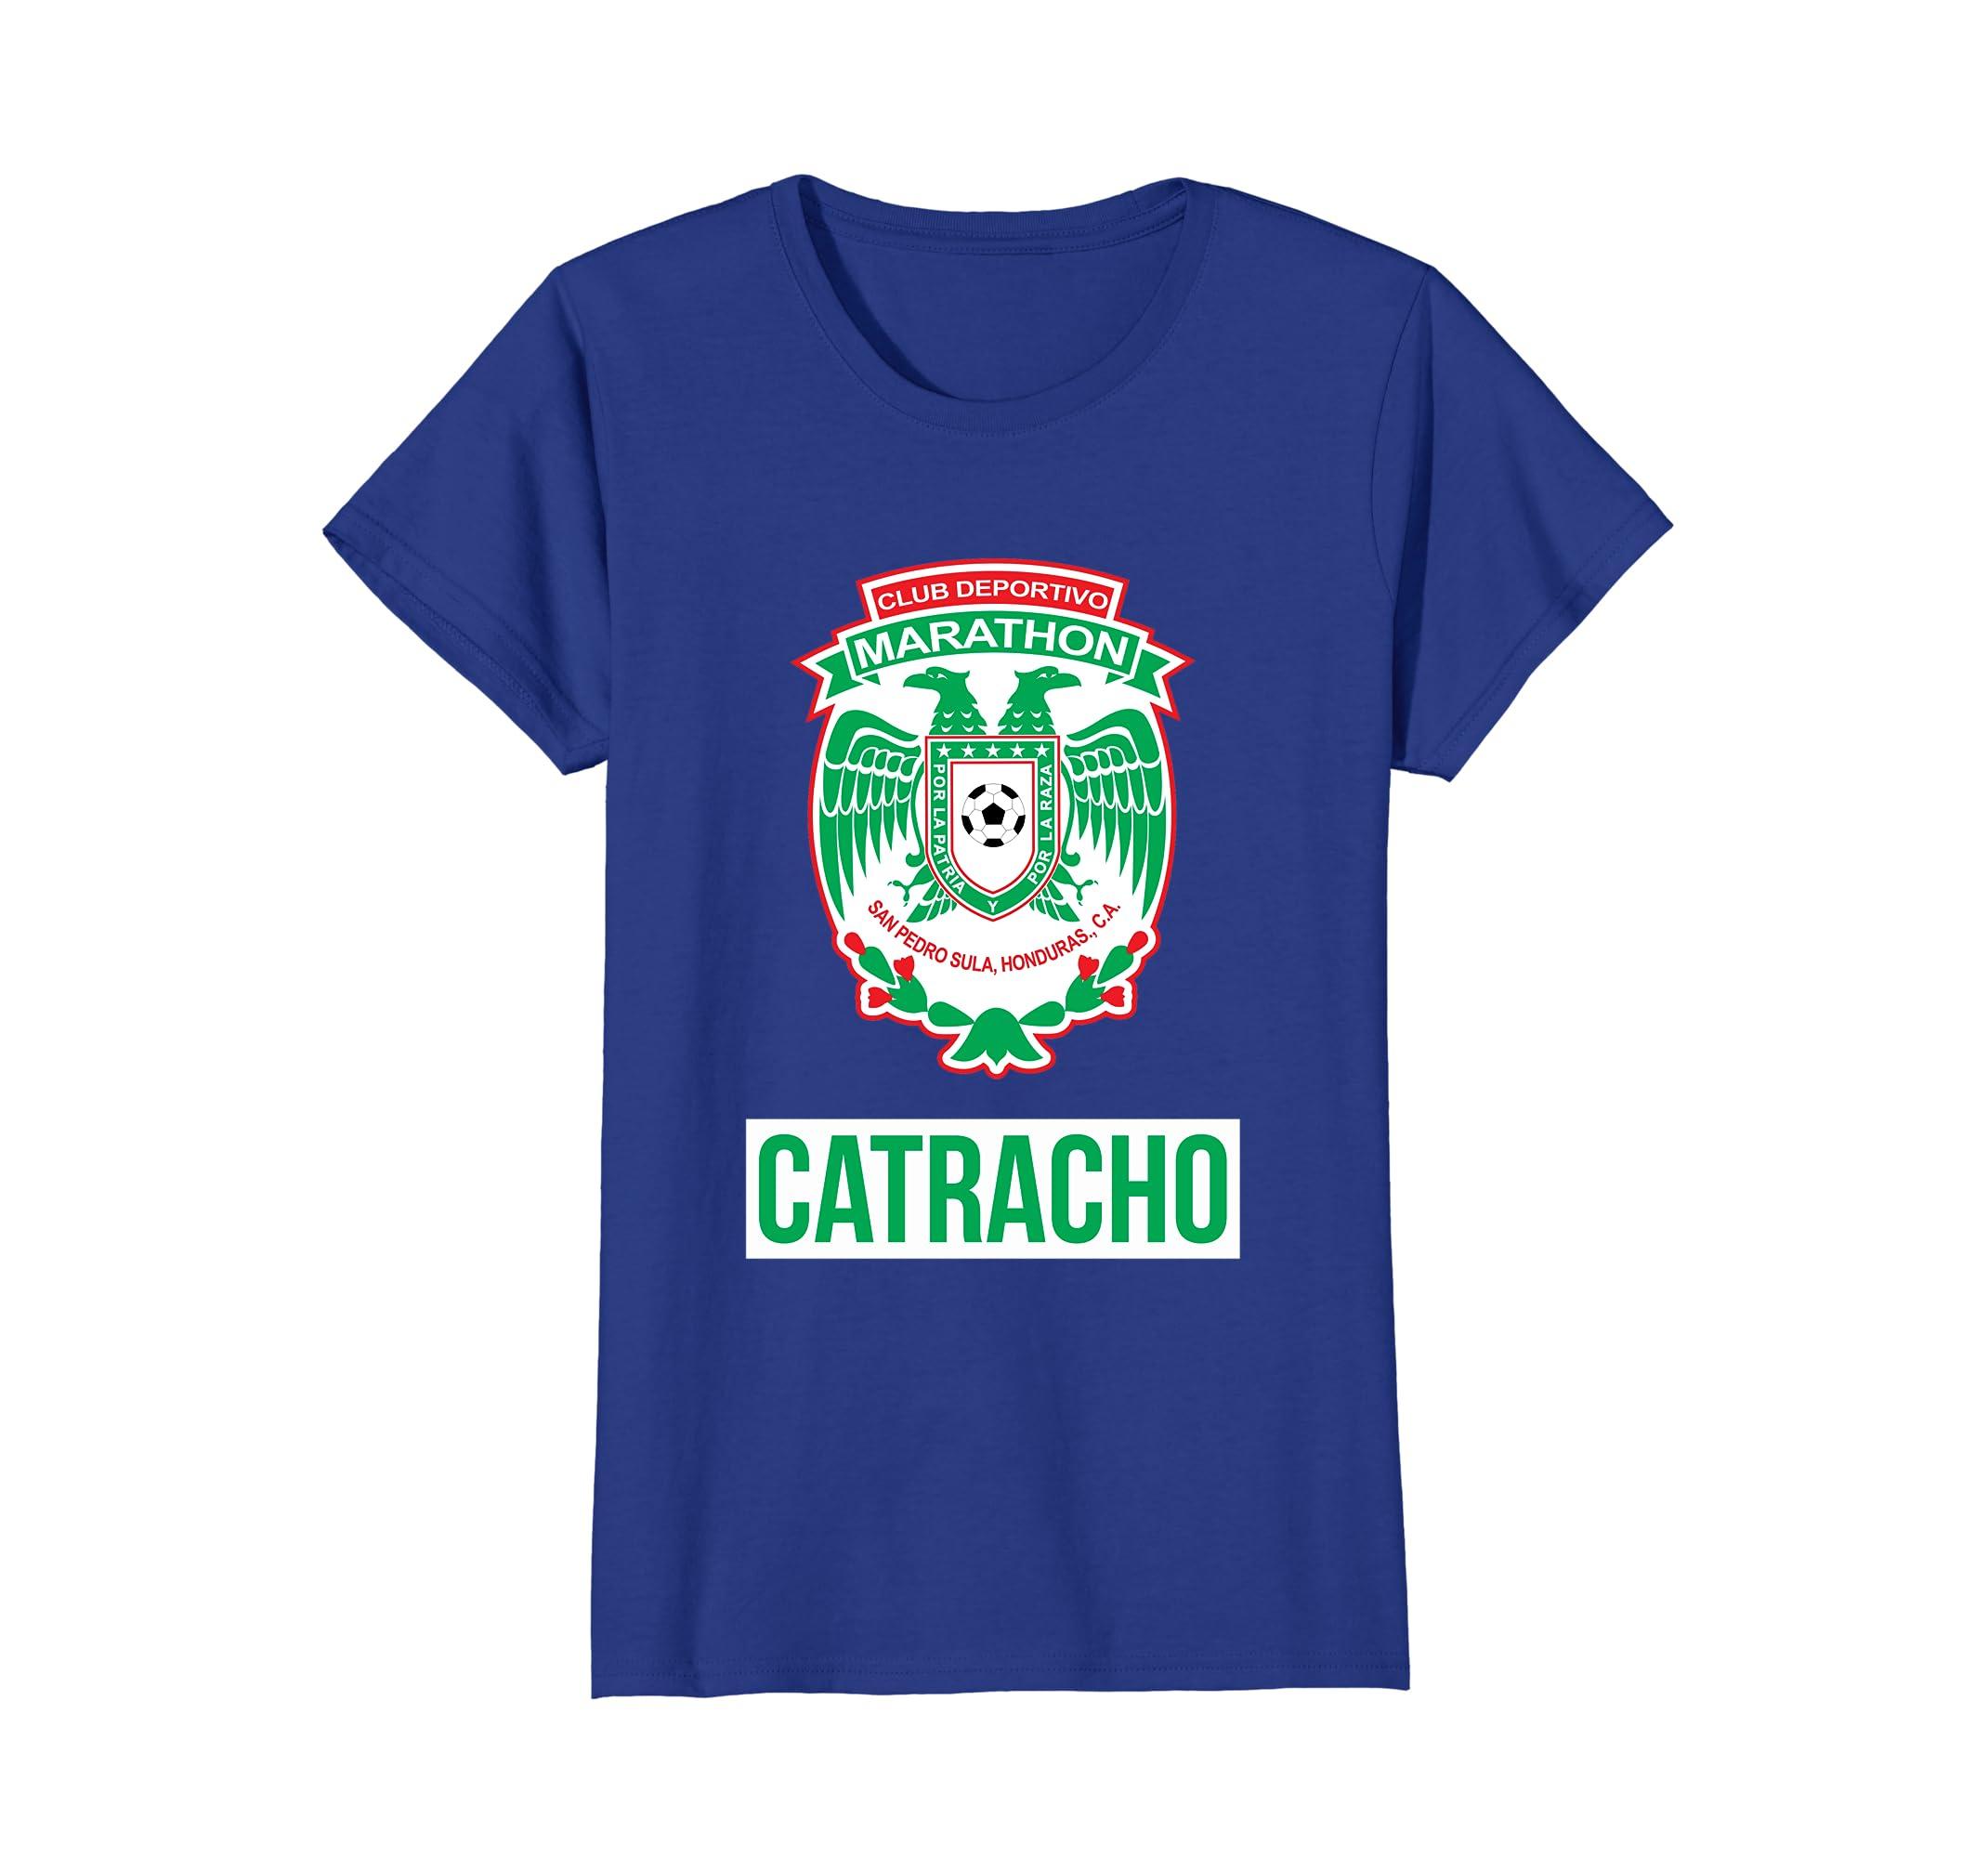 Amazon.com: Club deportivo Marathon, Liga Nacional, puro Monstruo: Clothing